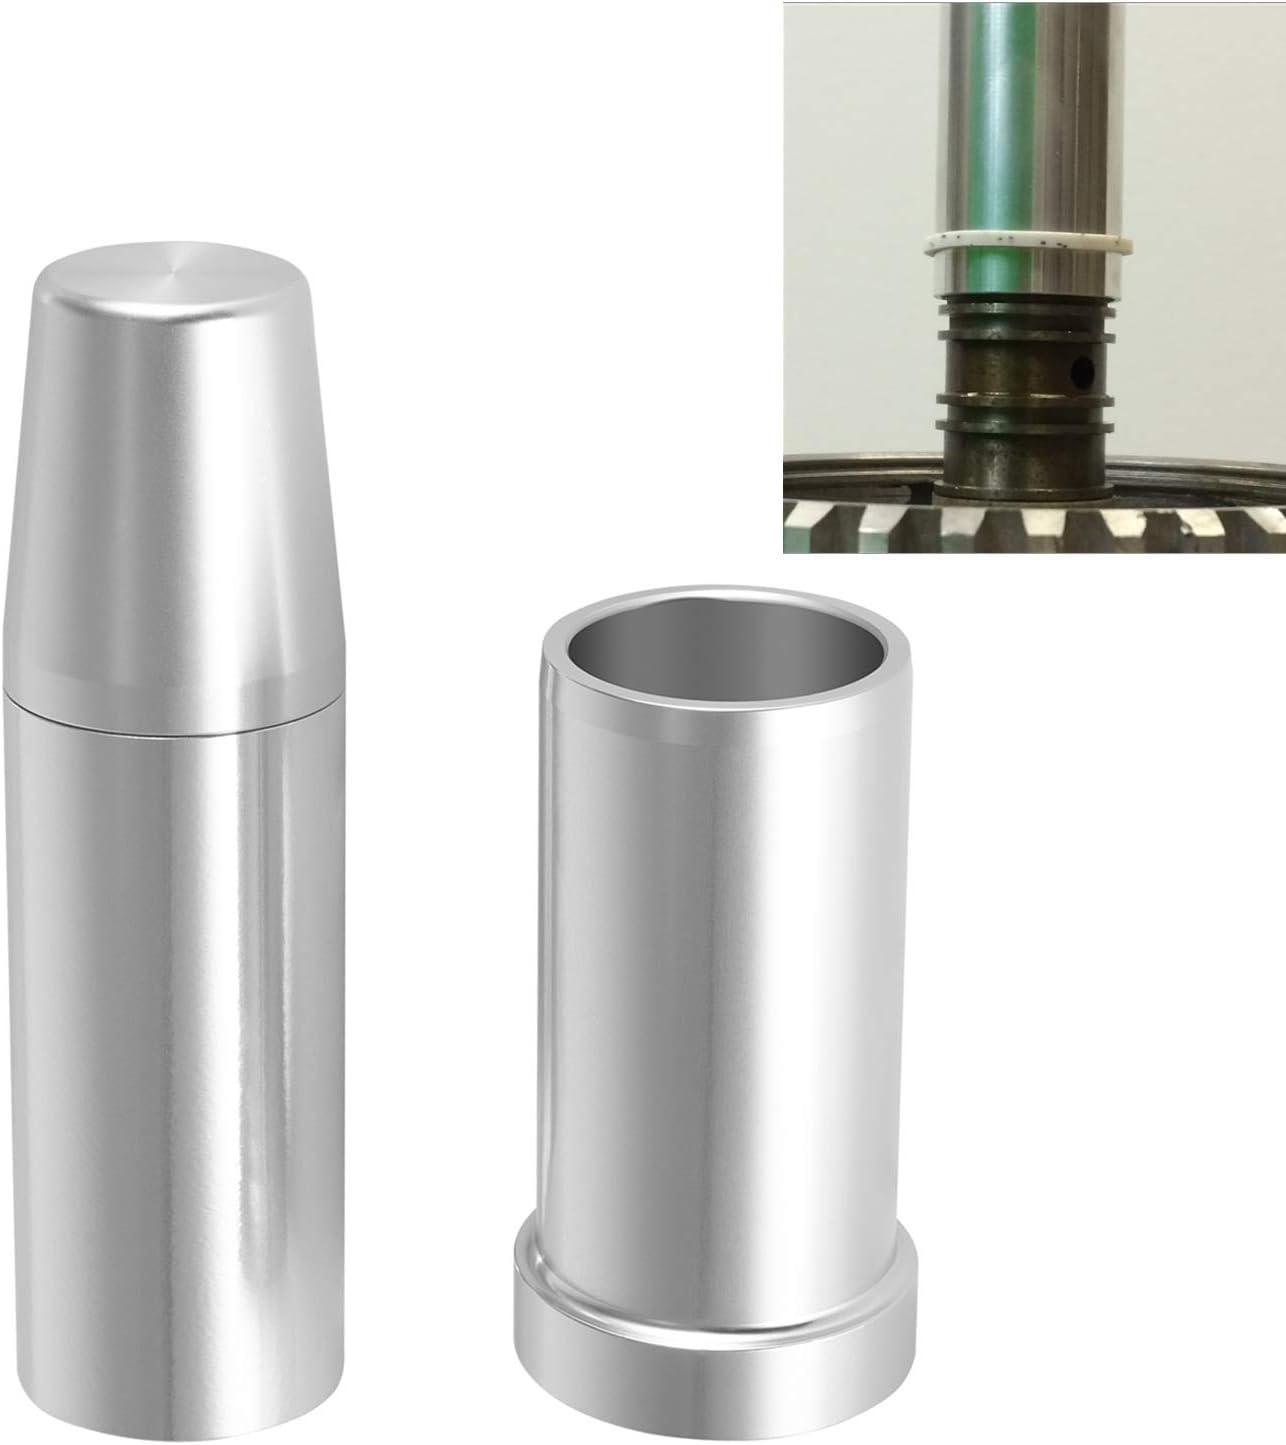 Year-end annual account Sunluway J-36418-C Turbine Shaft Teflon Selling rankings Resizer Installer Seal T